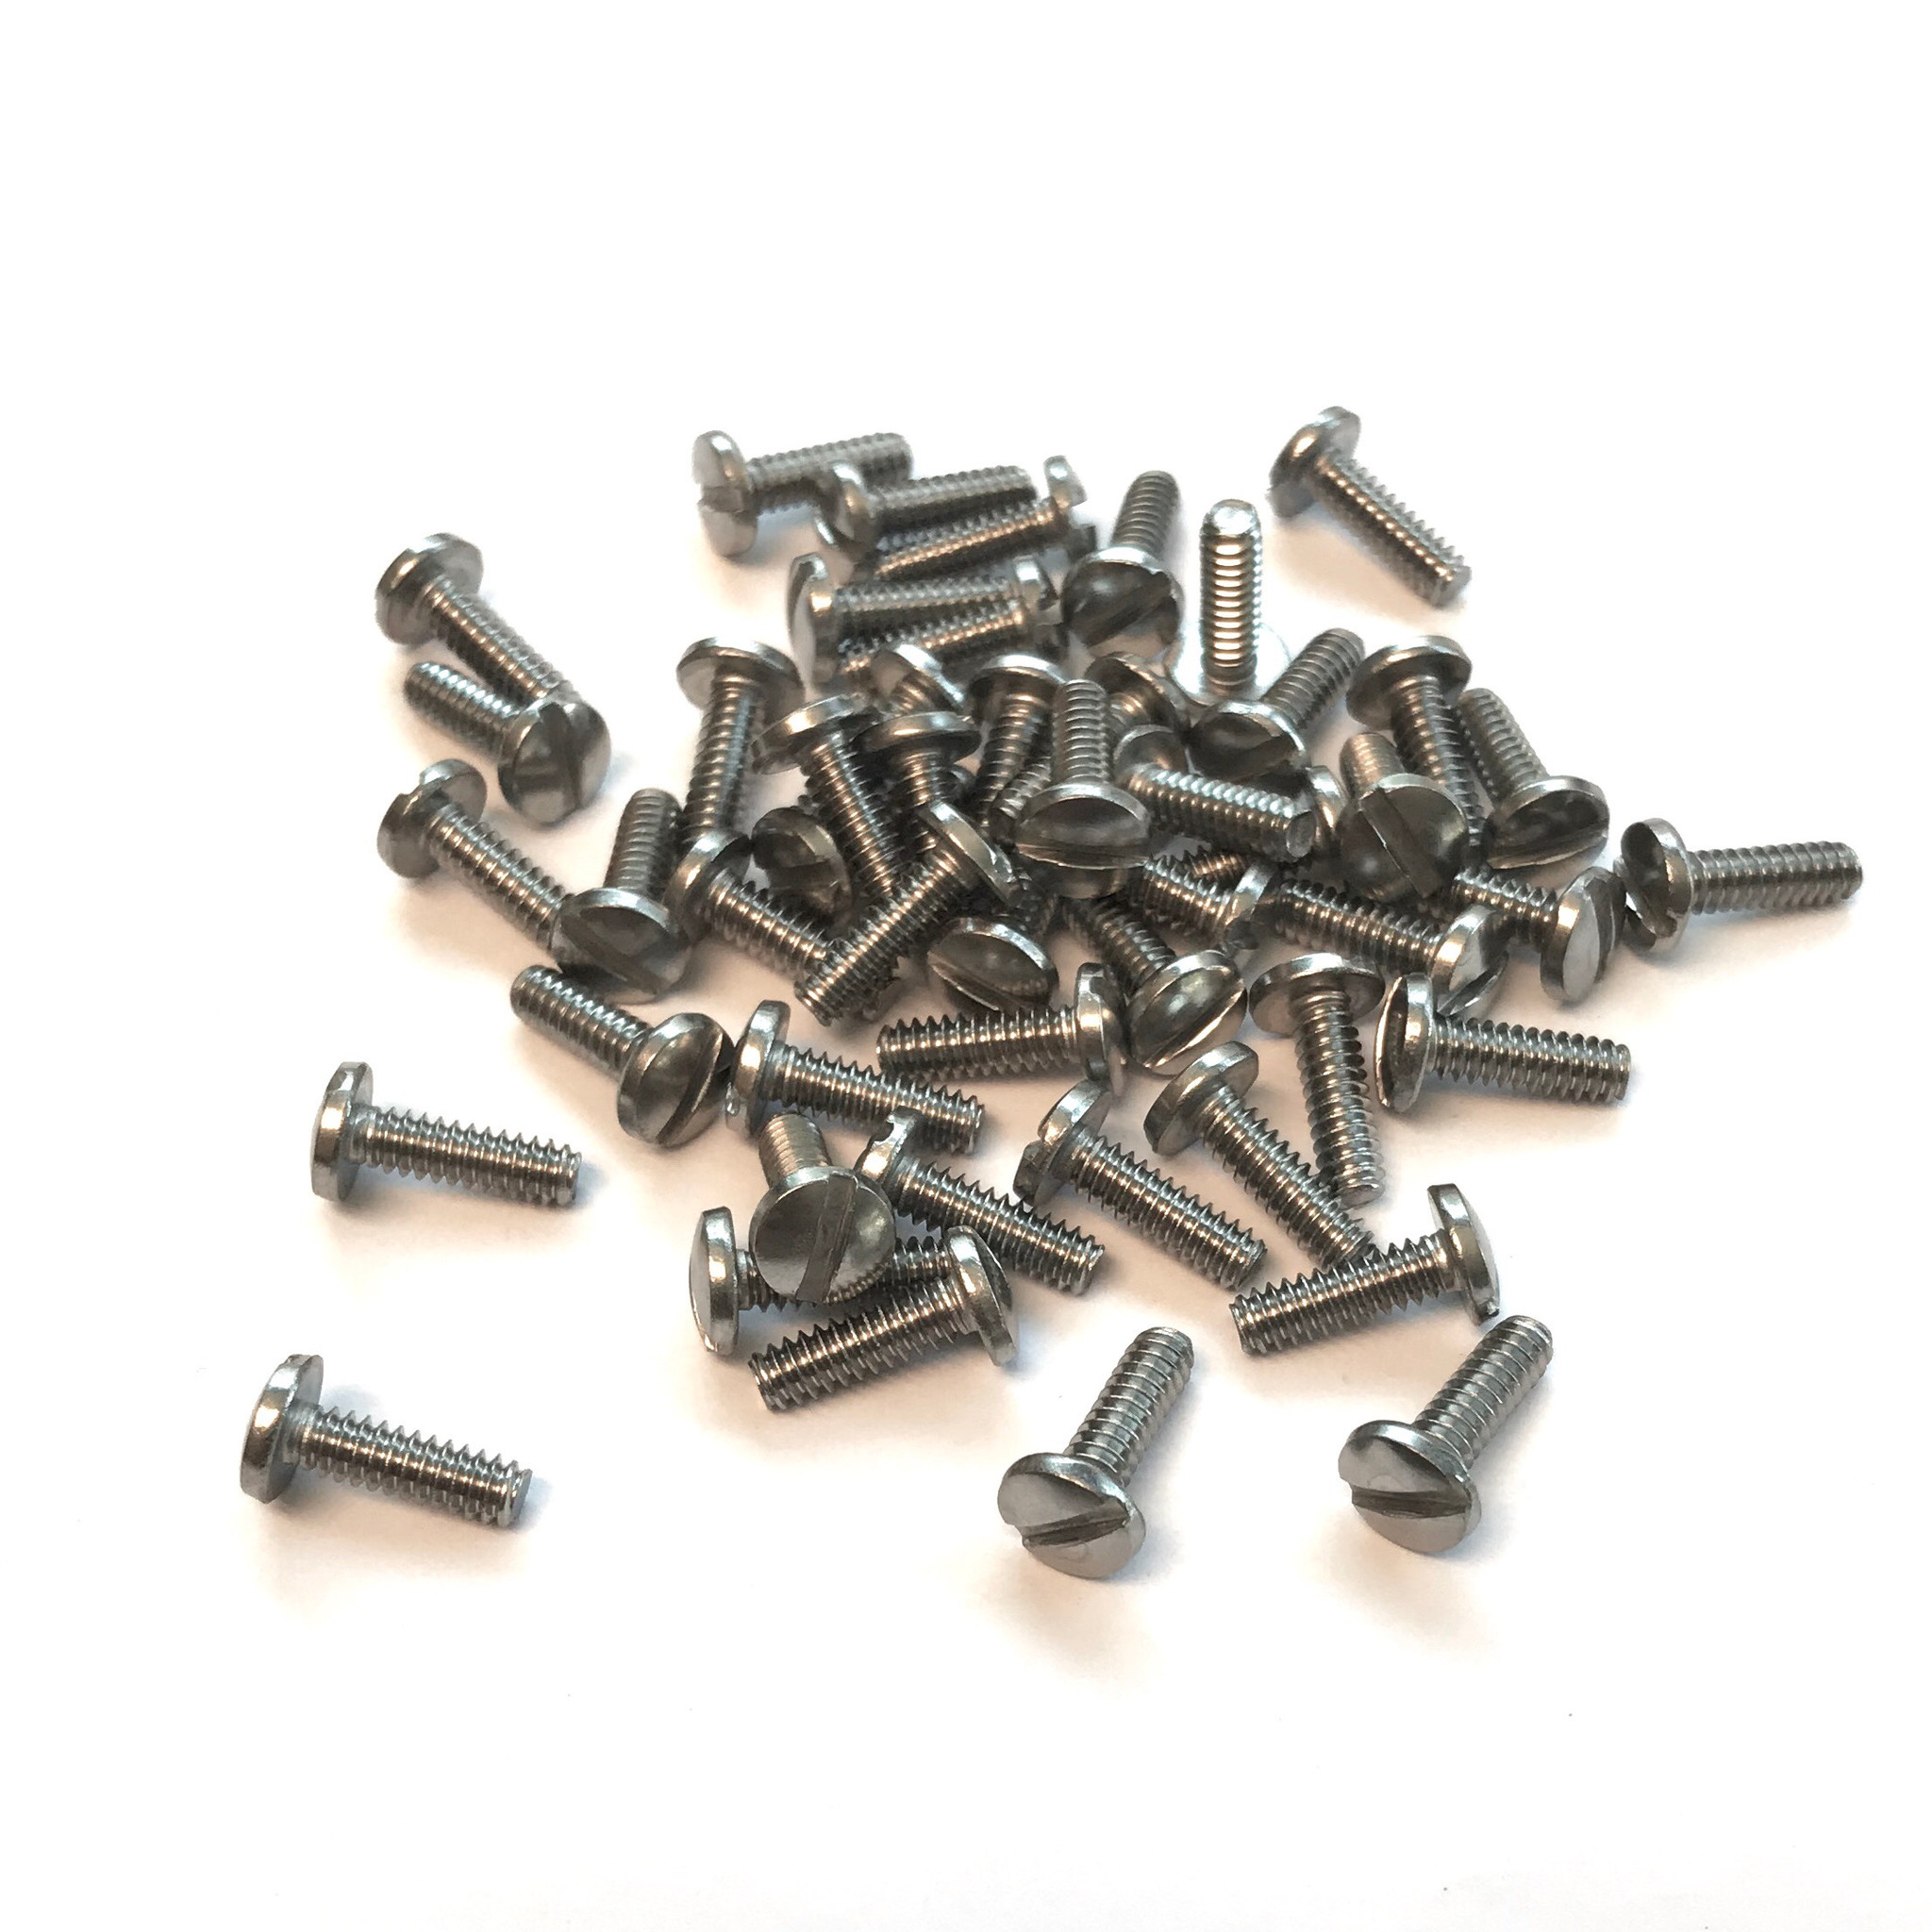 50 #6-32x5//16 Flat Head Slotted Machine Screws Stainless Steel